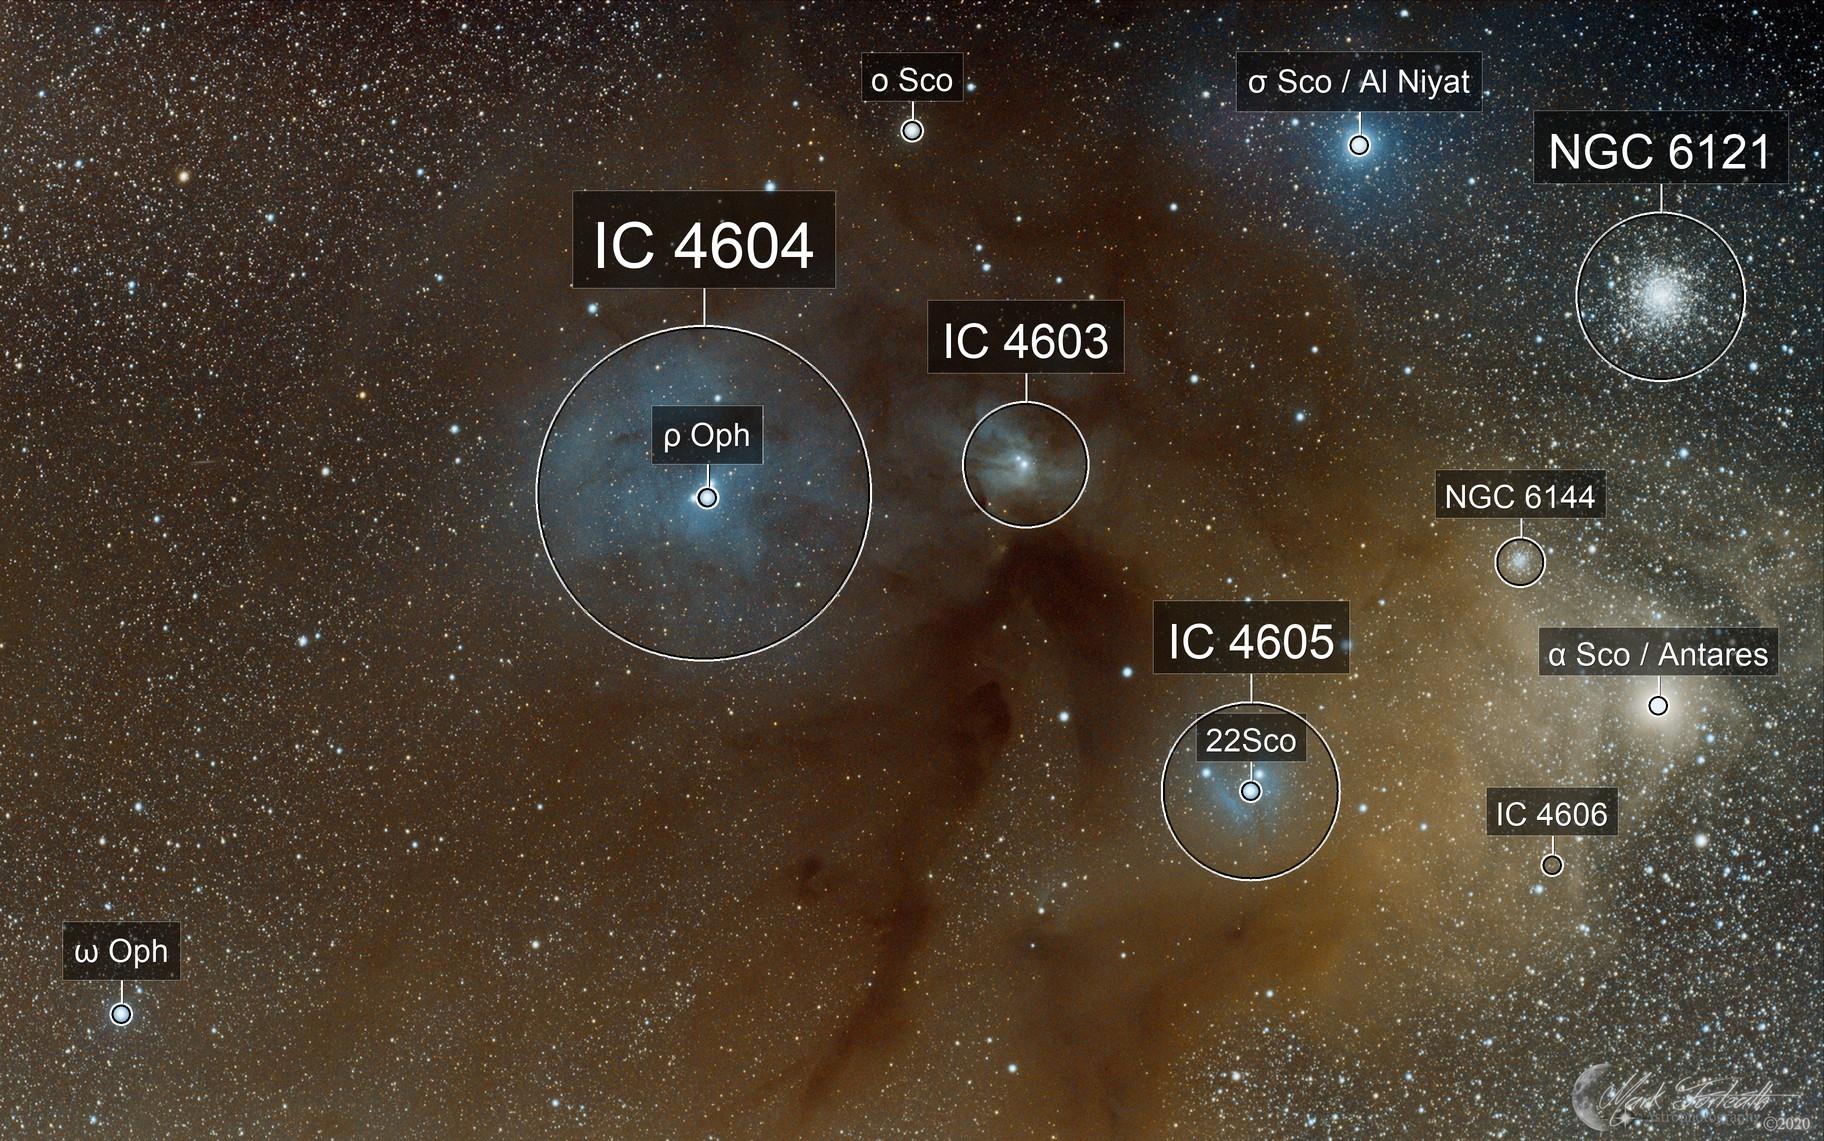 Rho Ophiuchi IC4604